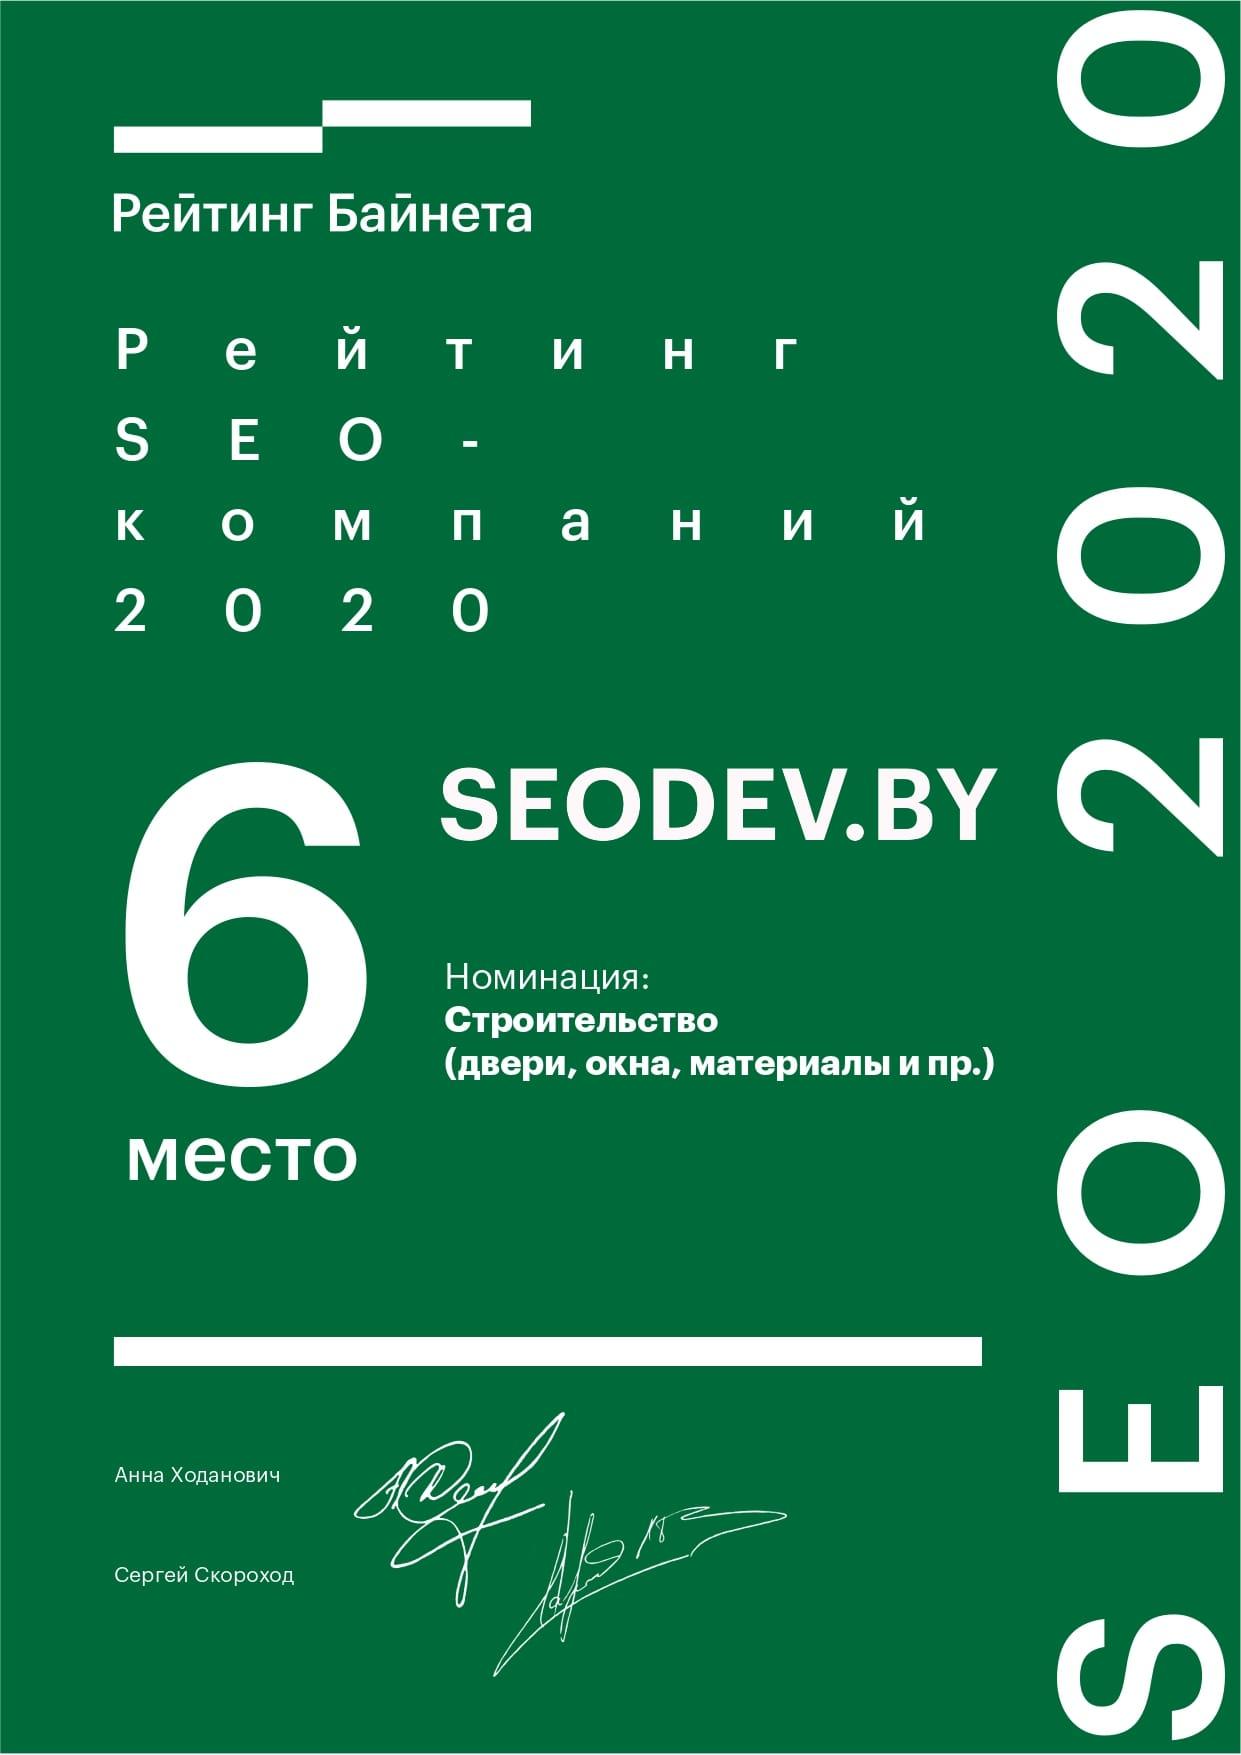 SEO_spec_page-0002